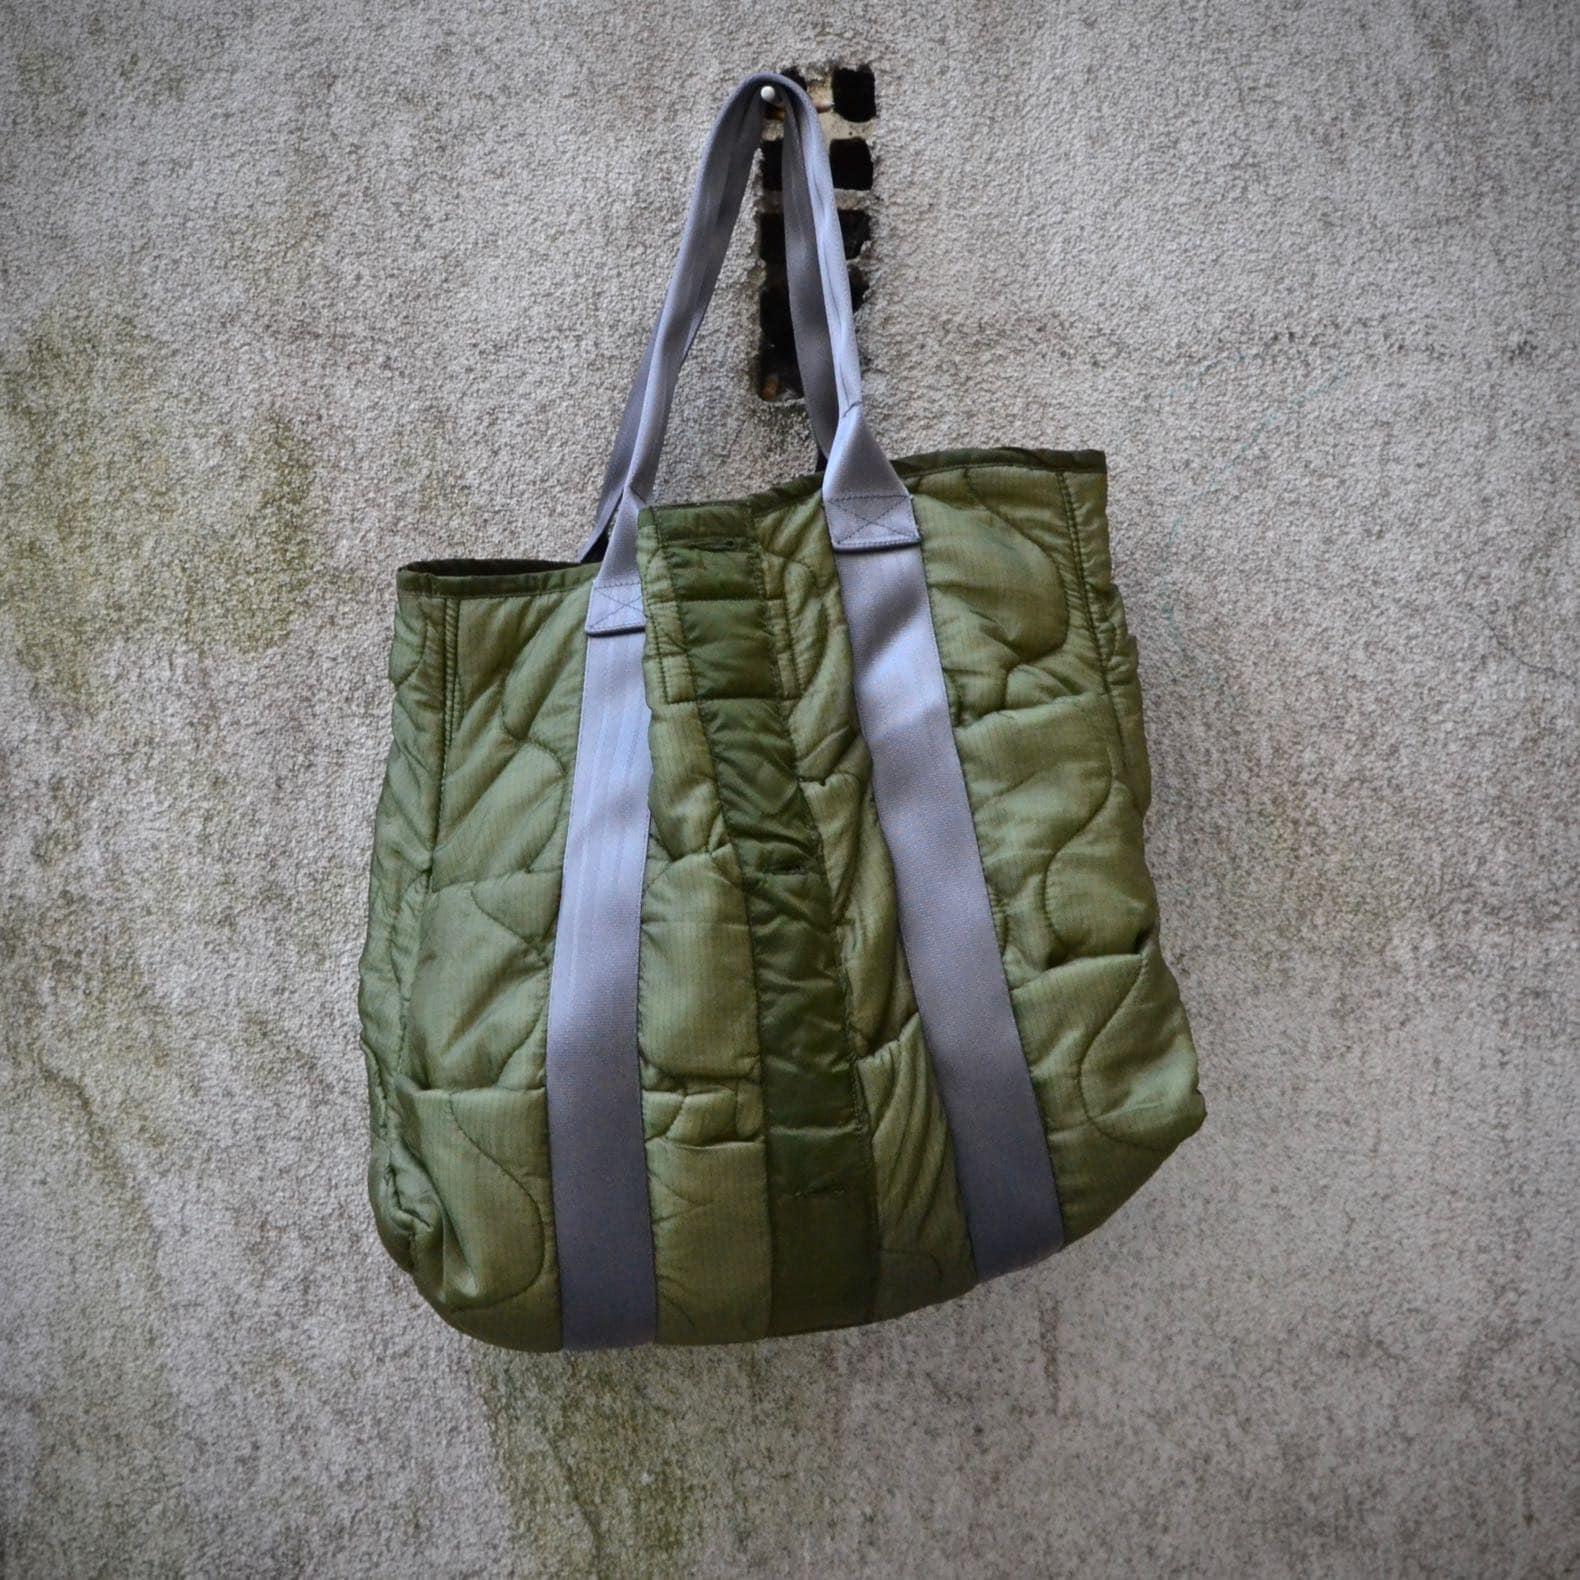 tote bag liner m65 upcycling arashi by boras